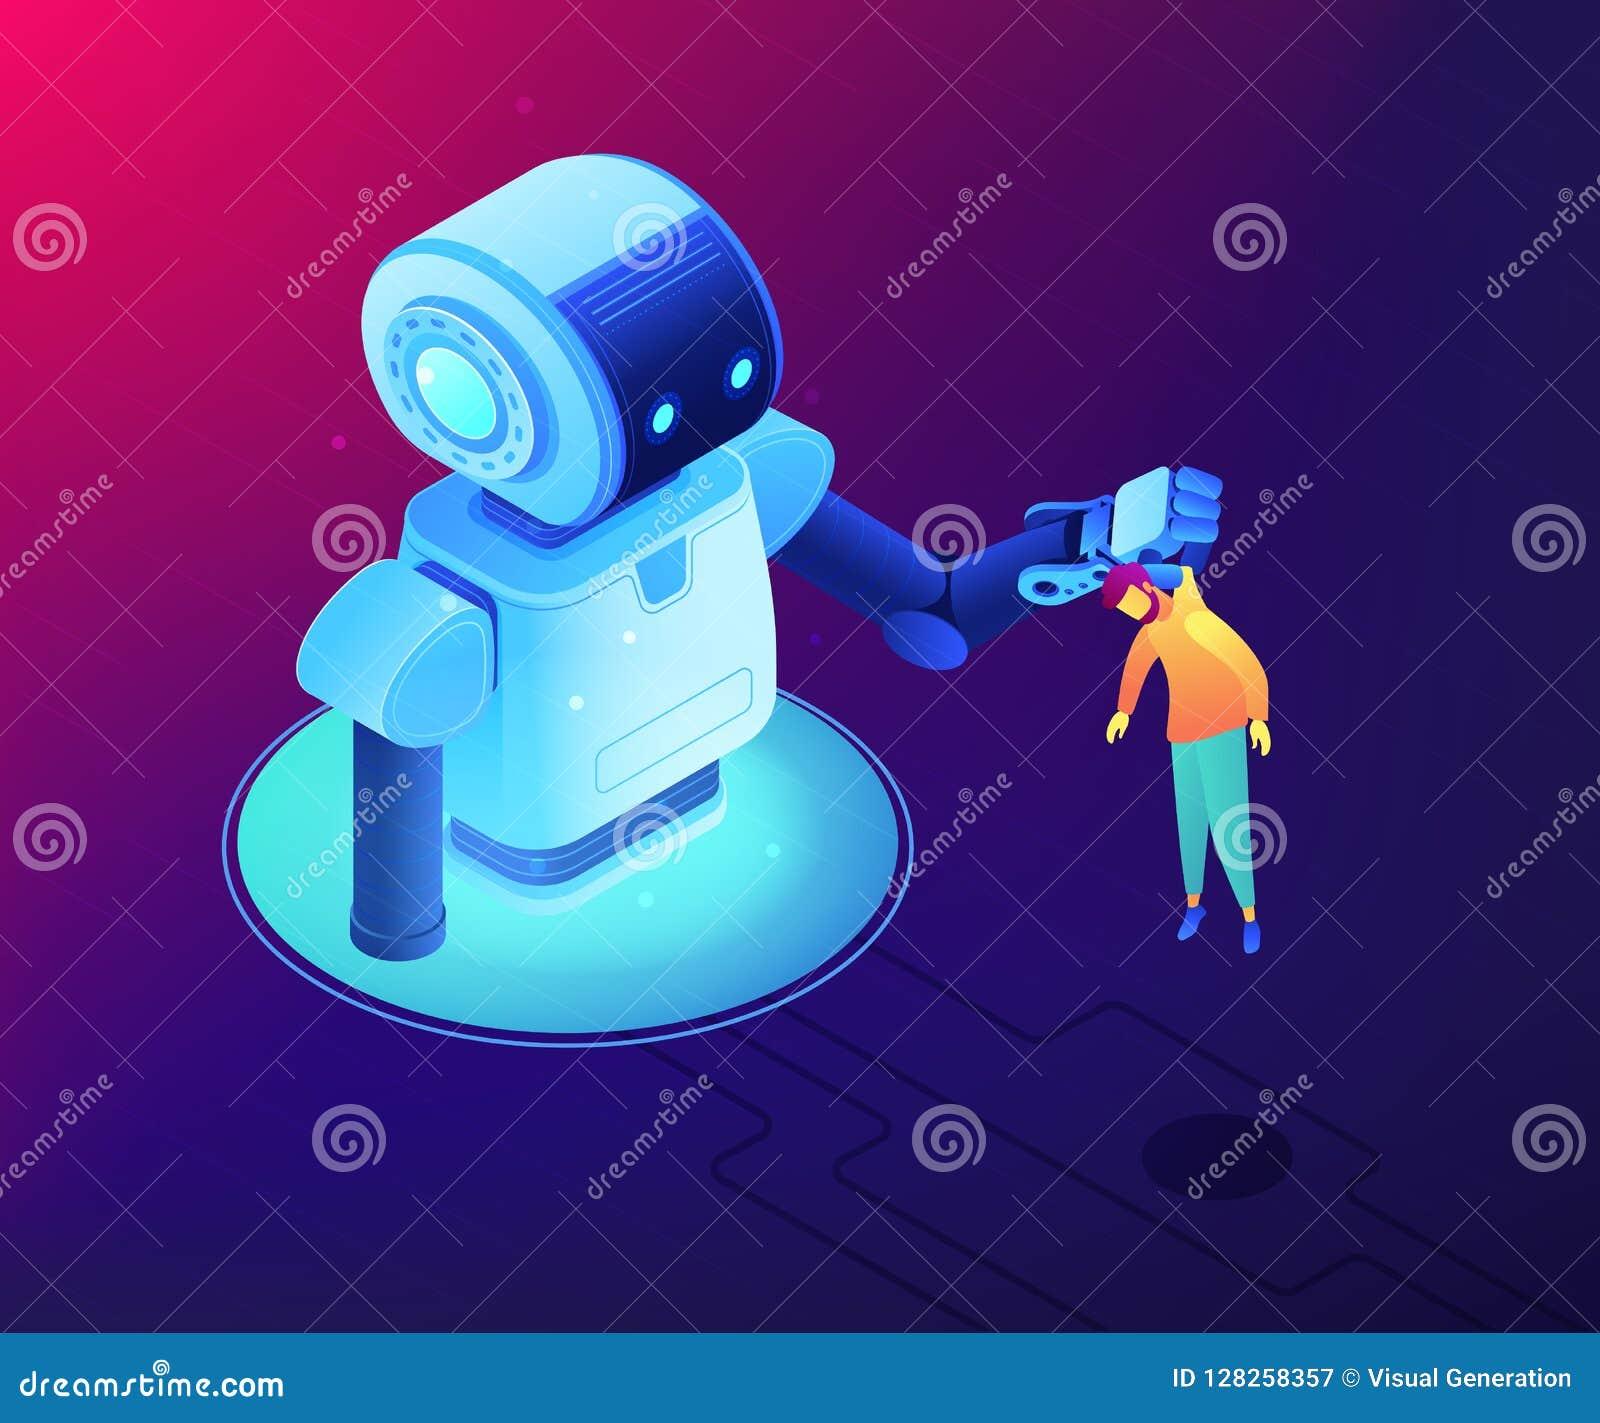 Human-robot Interaction Concept Vector Isometric Illustration  Stock